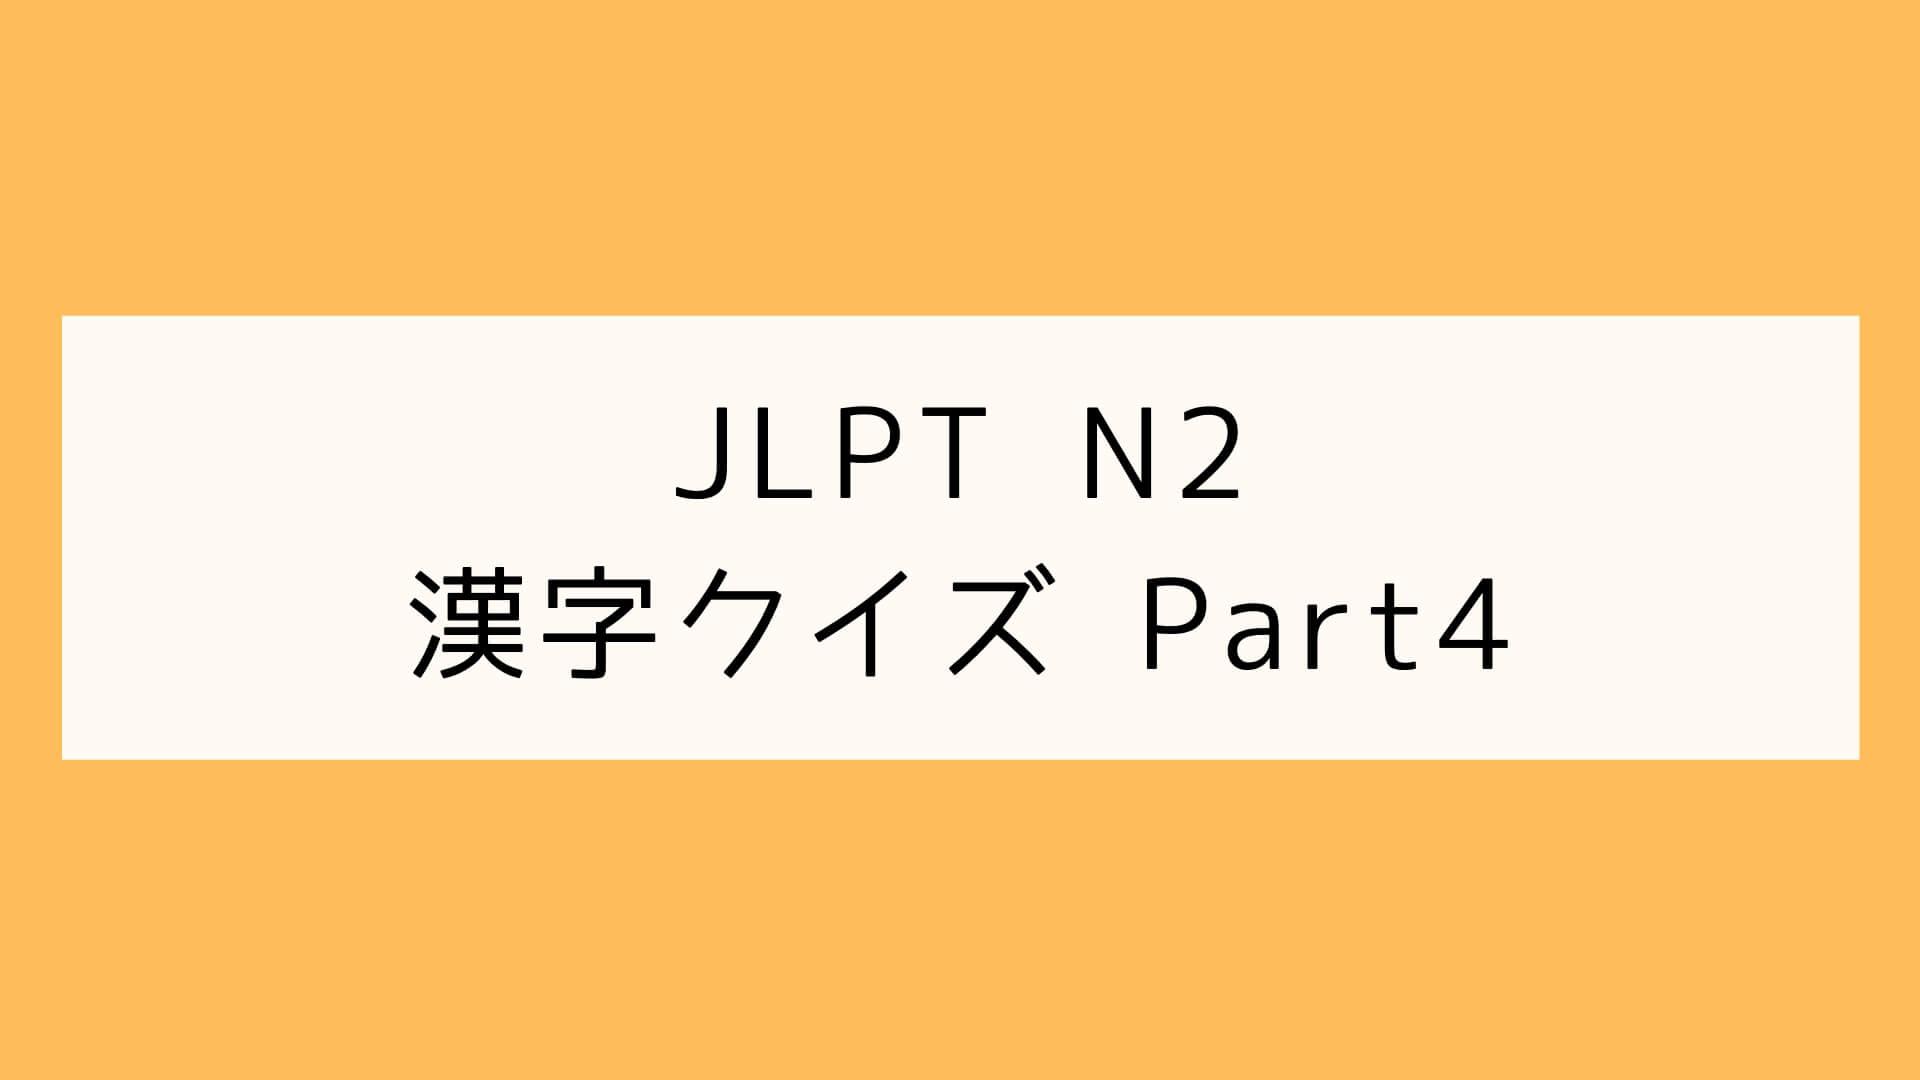 【JLPT N2】漢字クイズ Part4